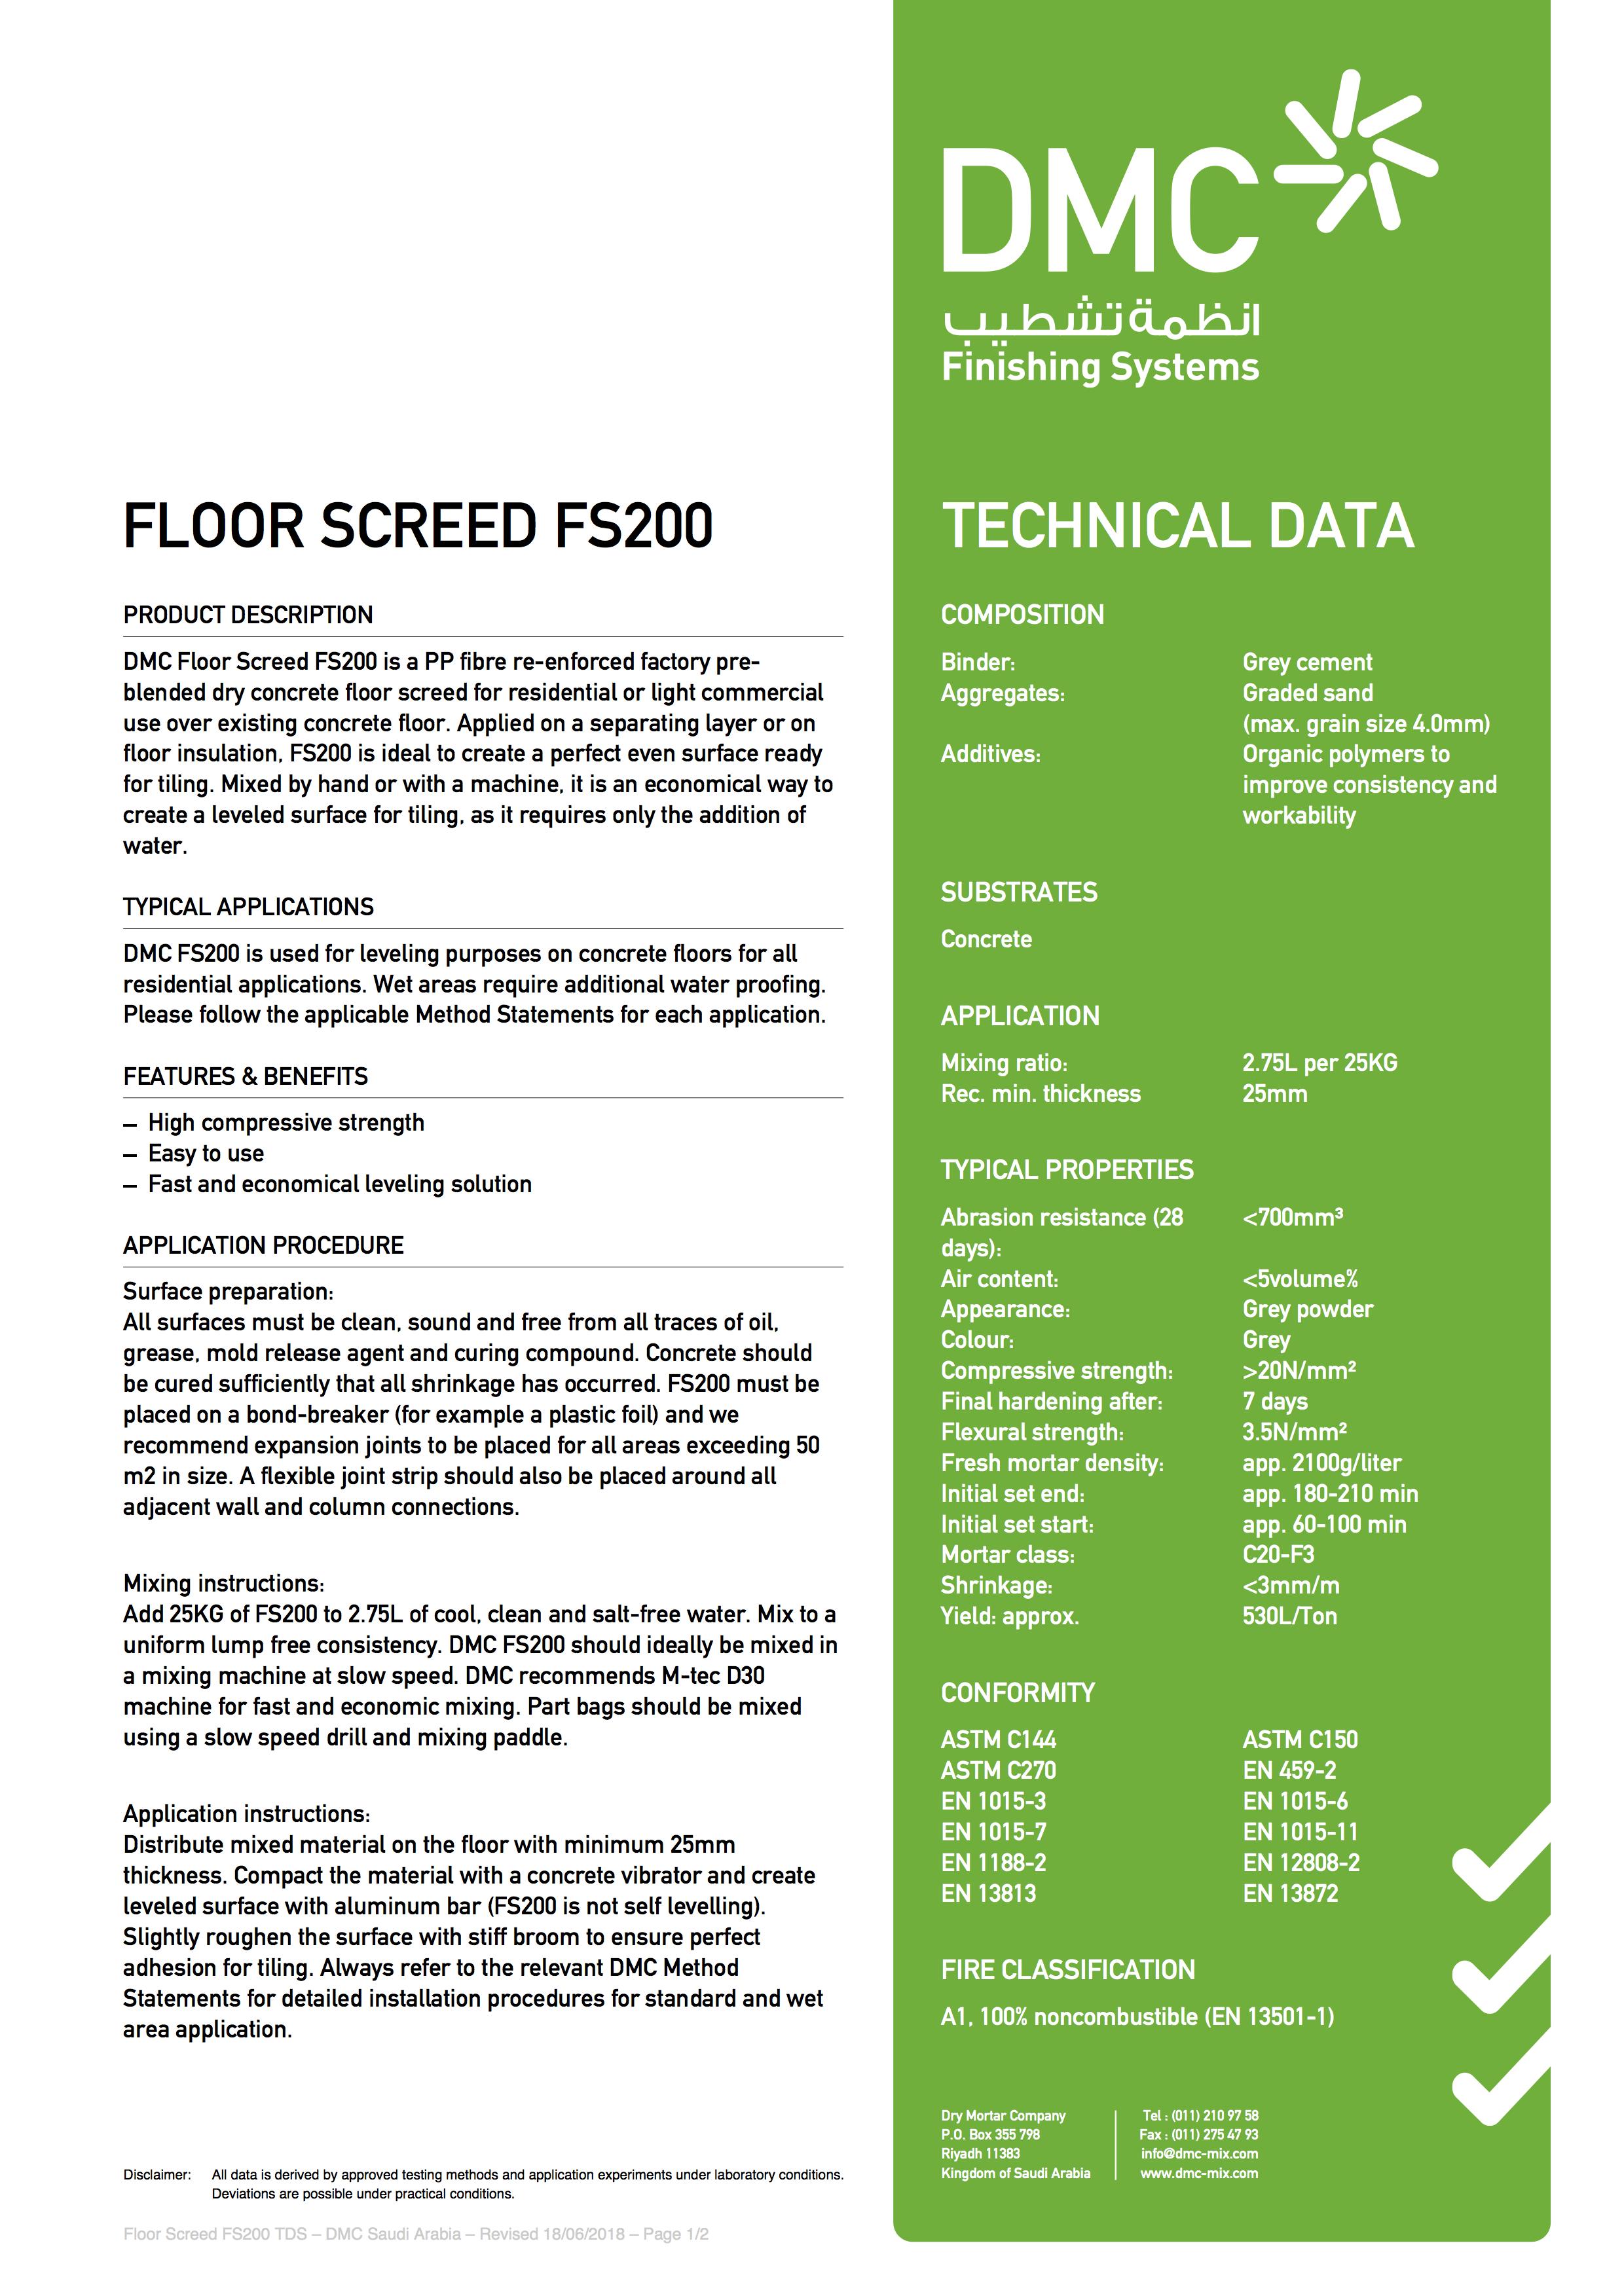 DMC Mix | Floor Screed FS200